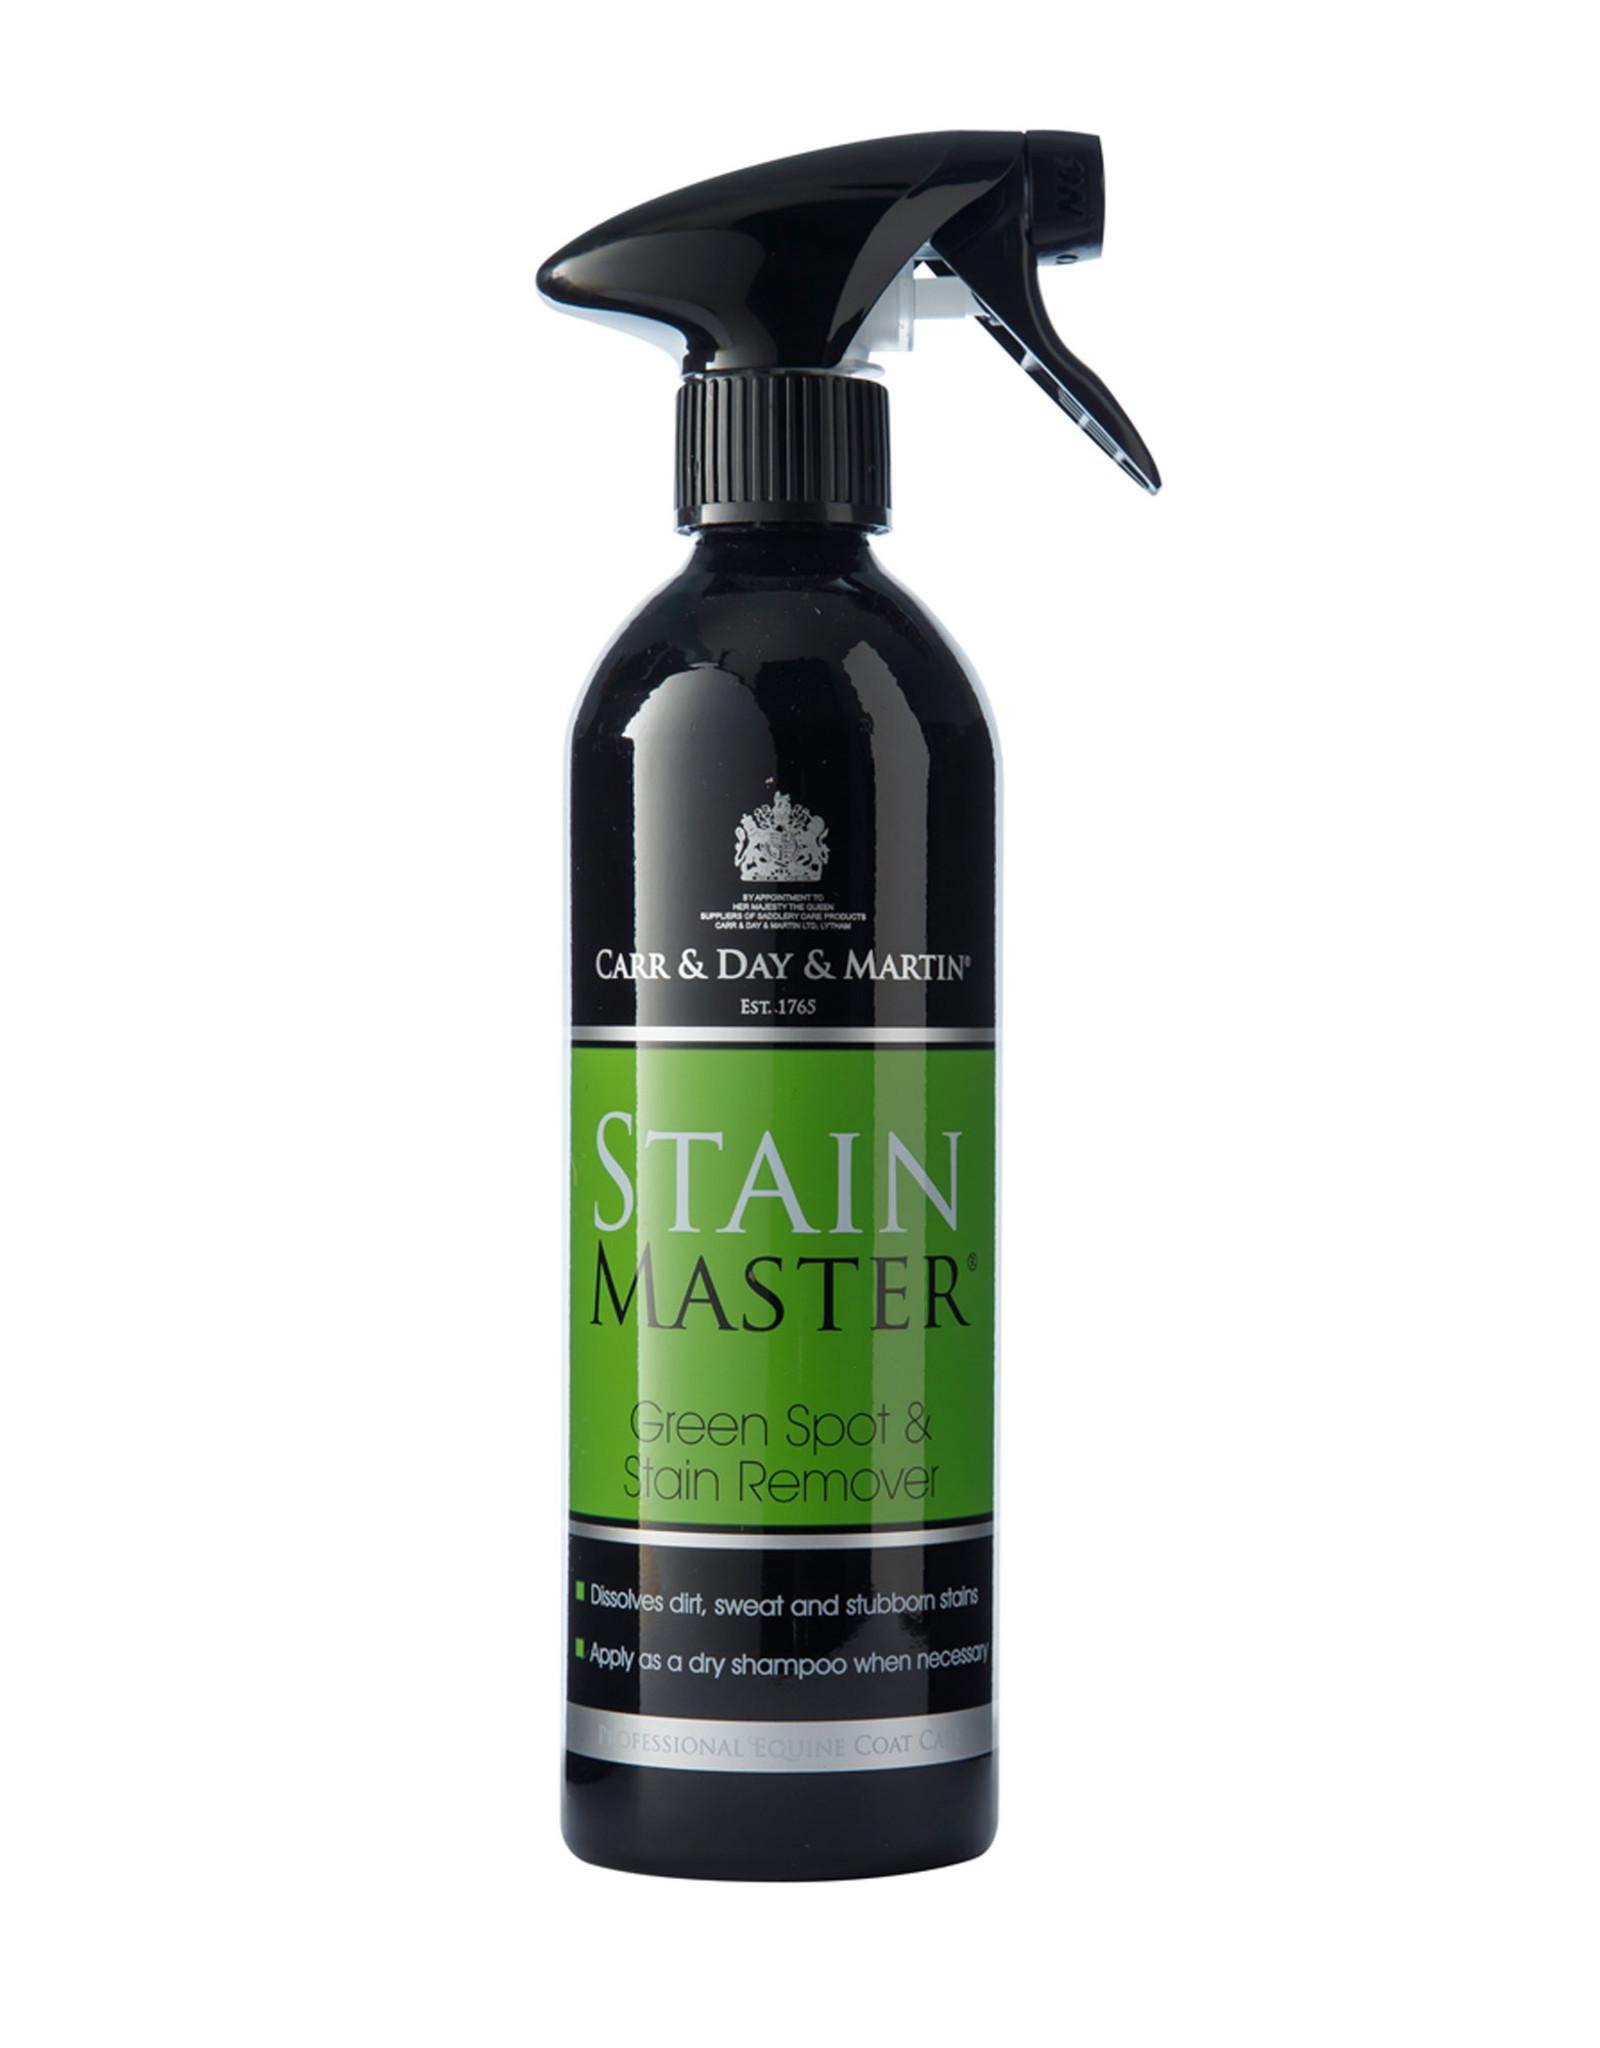 Carr & Day & Martin Stain Master Spray